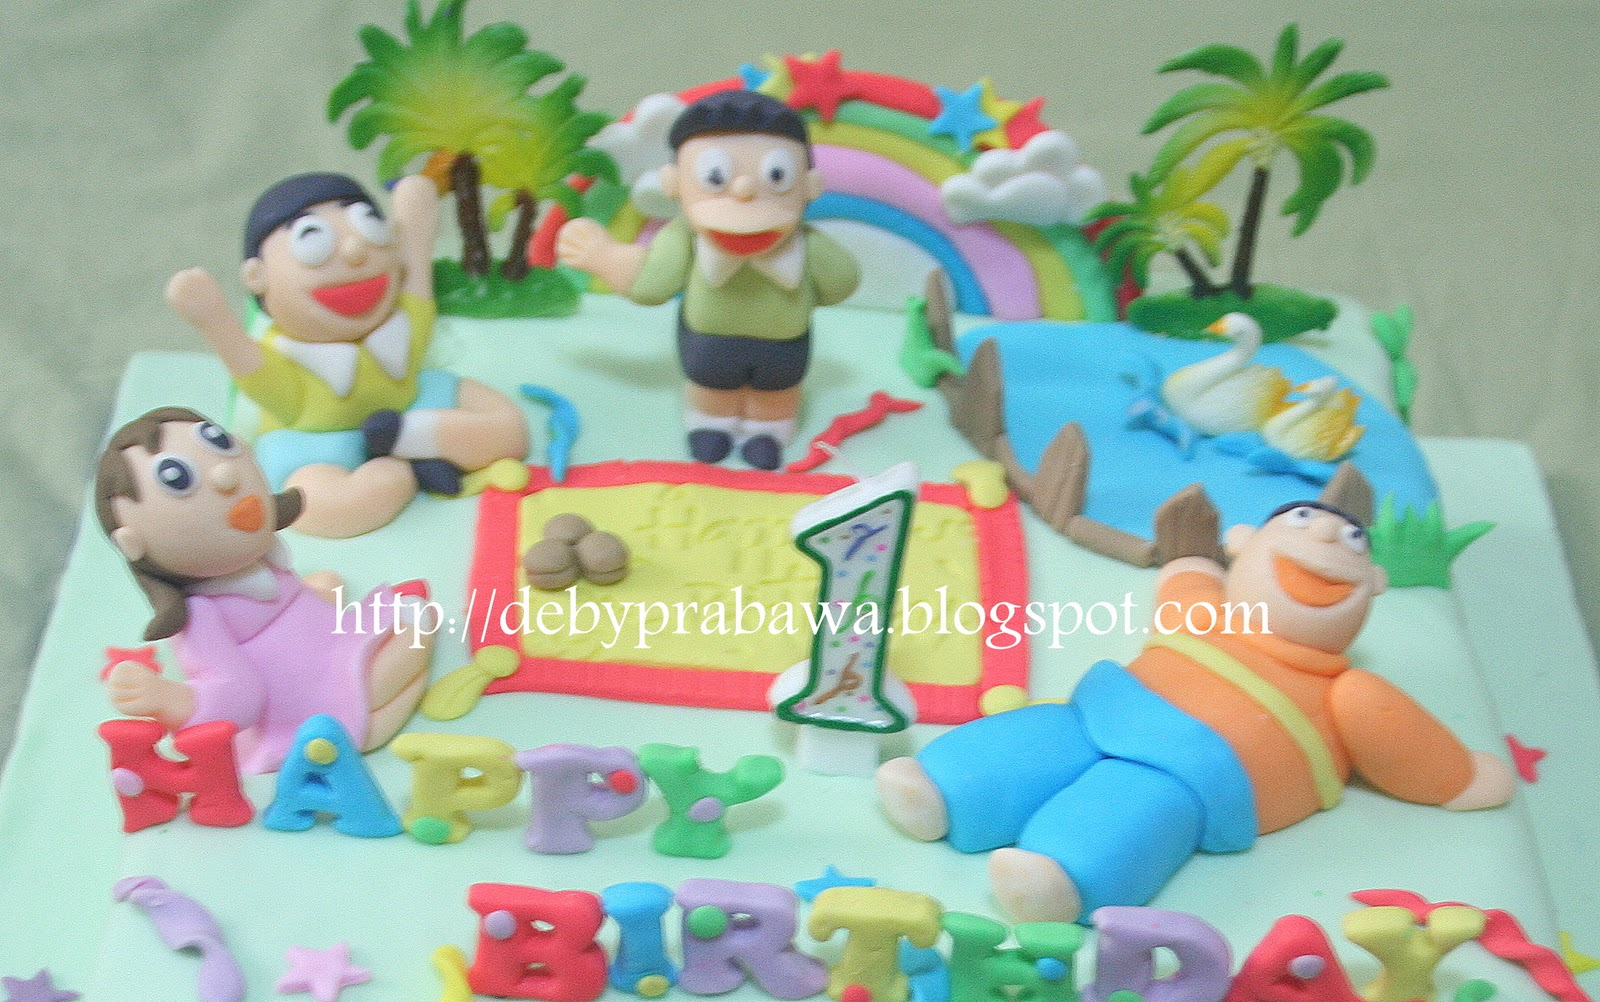 Doraemon Images For Cake : Doraemon And Friends Cake www.pixshark.com - Images ...